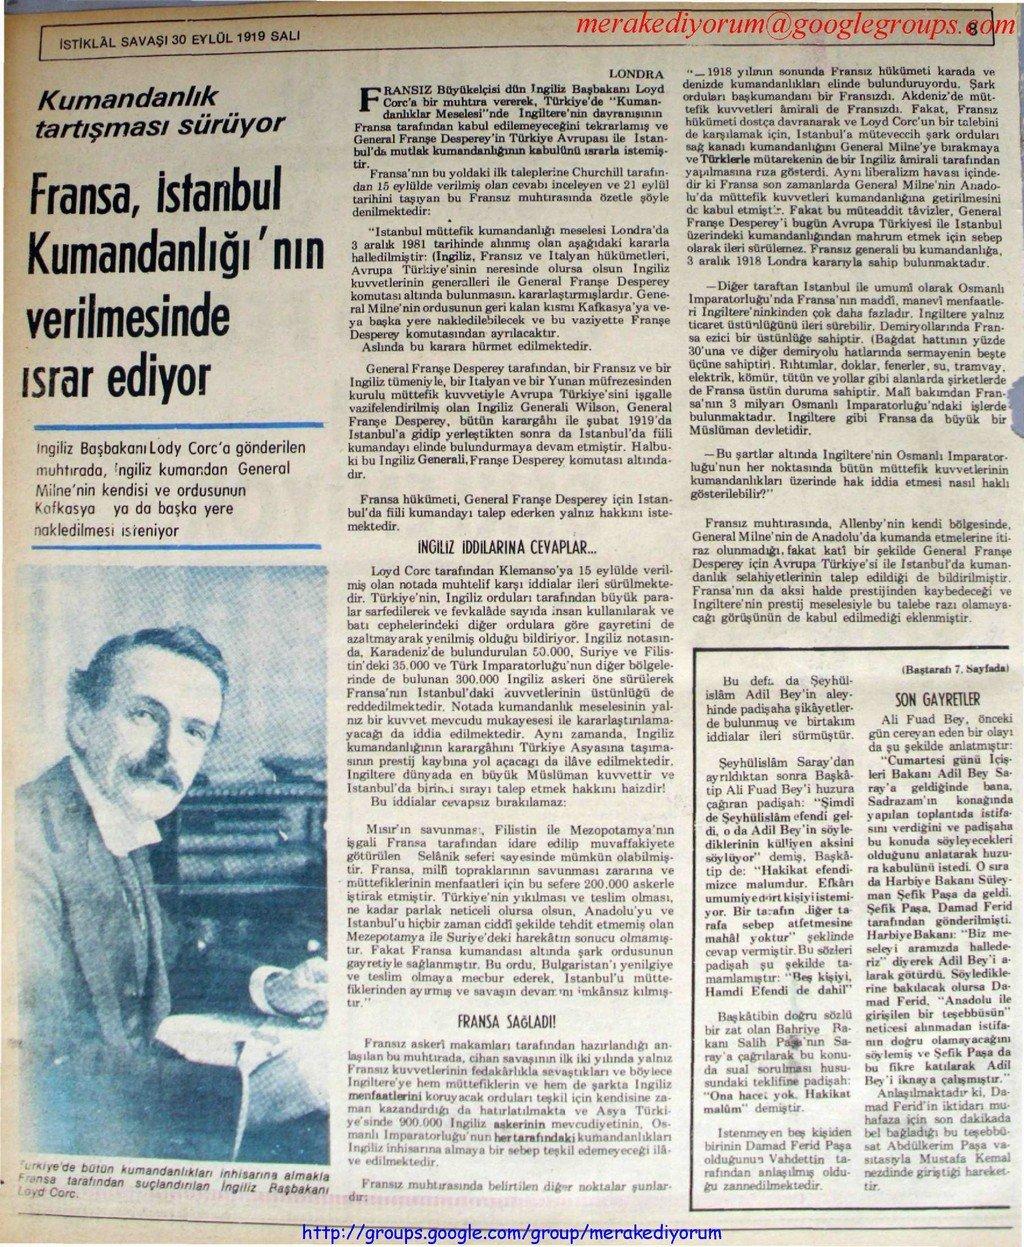 istiklal savaşı gazetesi - 30 eylül 1919